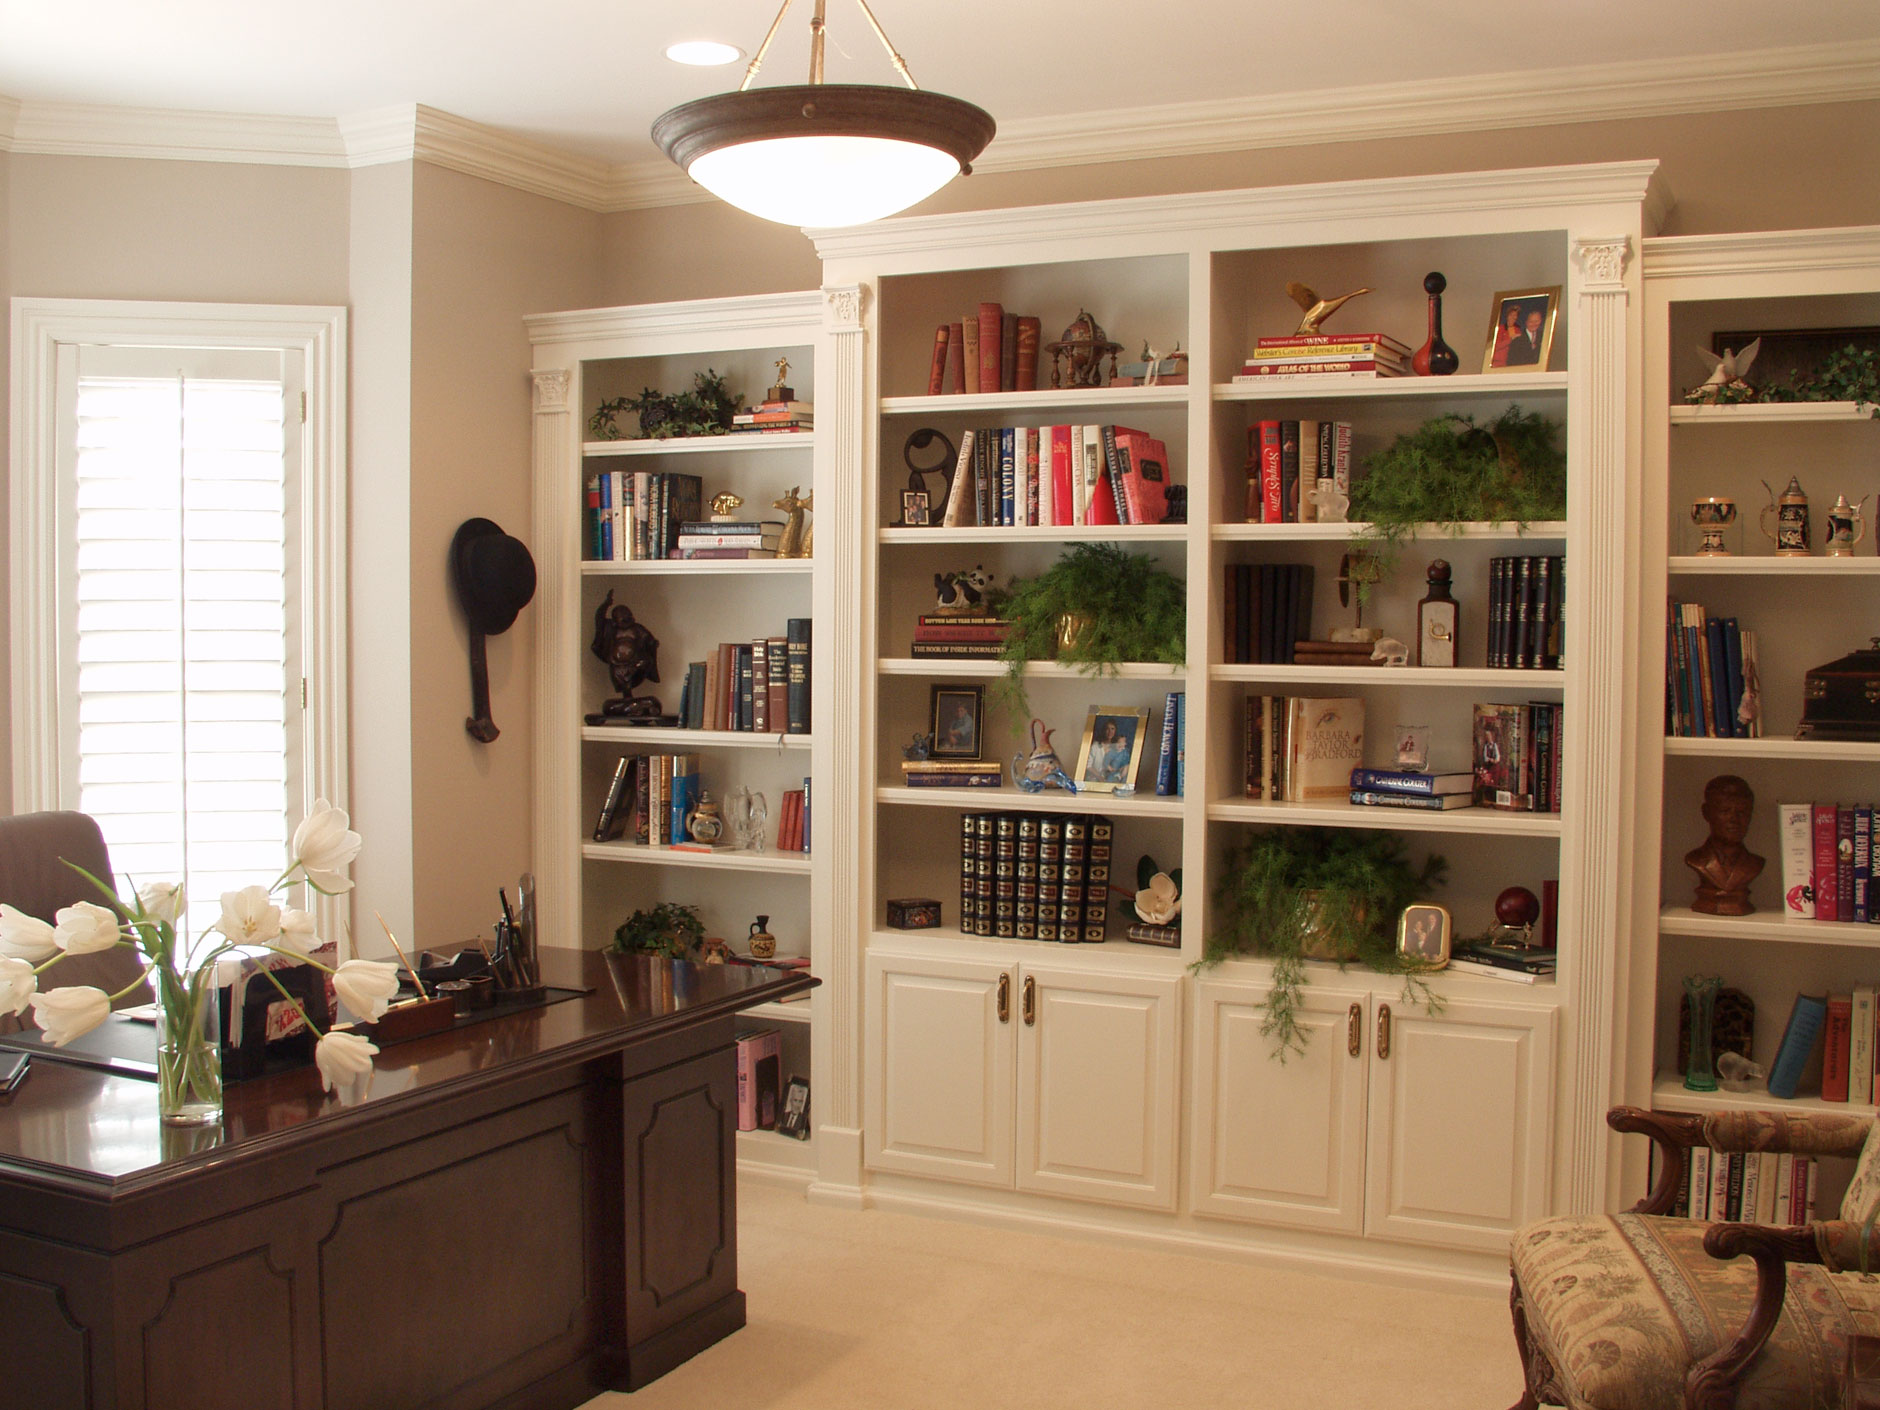 Office bookshelf shown with C101 OE8, IE1, RP1 cabinet doors